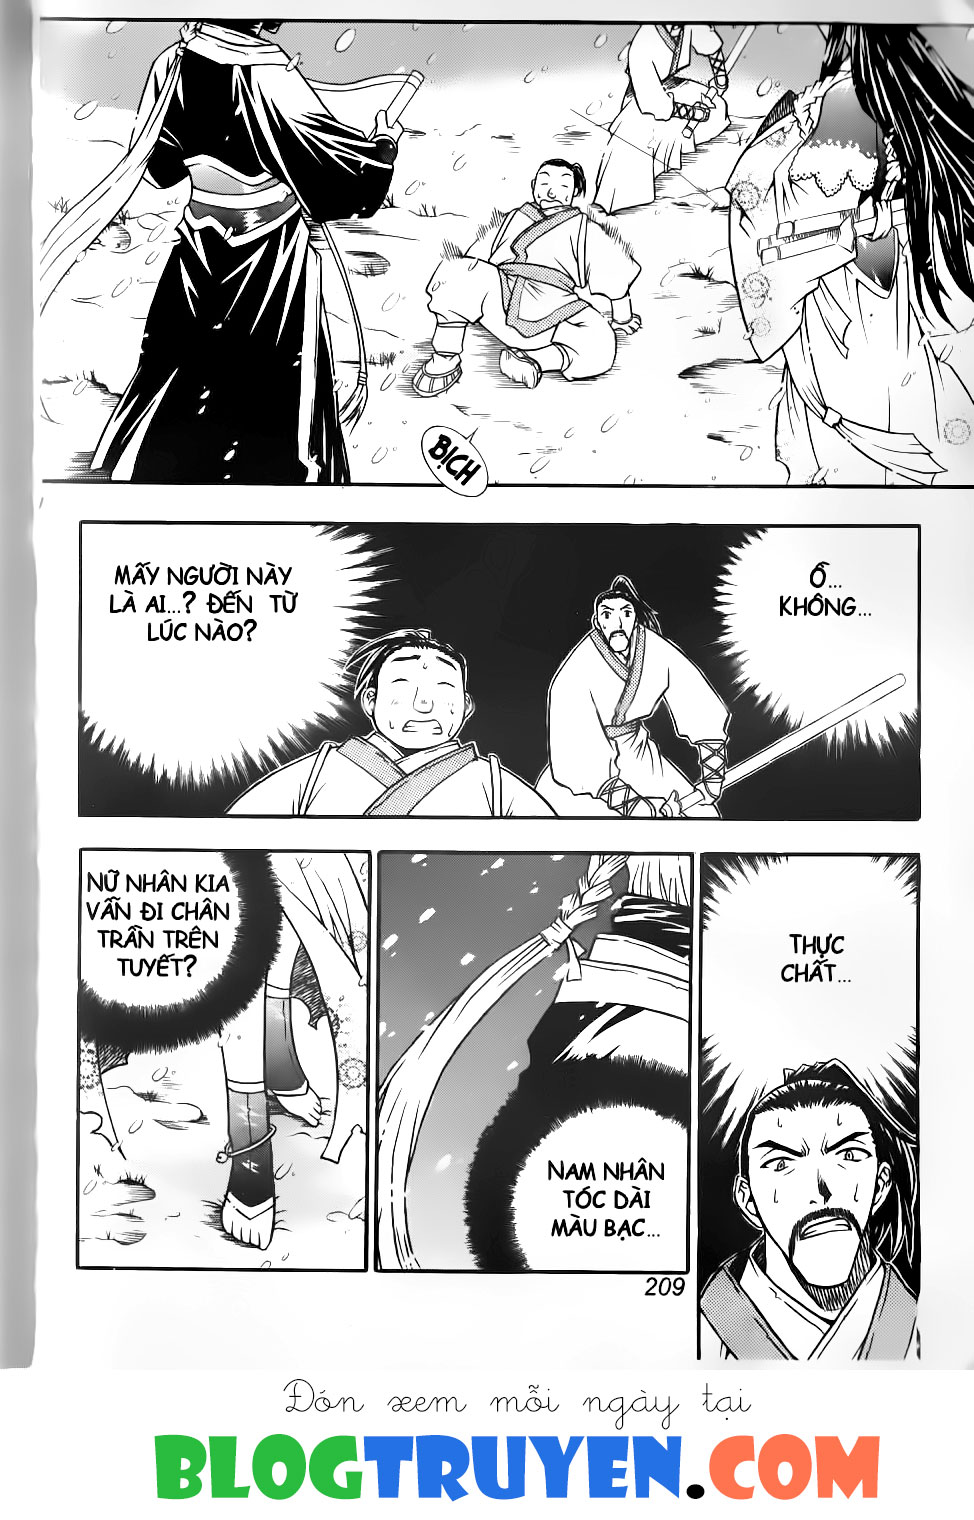 Thiên Lang Liệt Truyện Scan Chap 102 - Truyen.Chap.VN